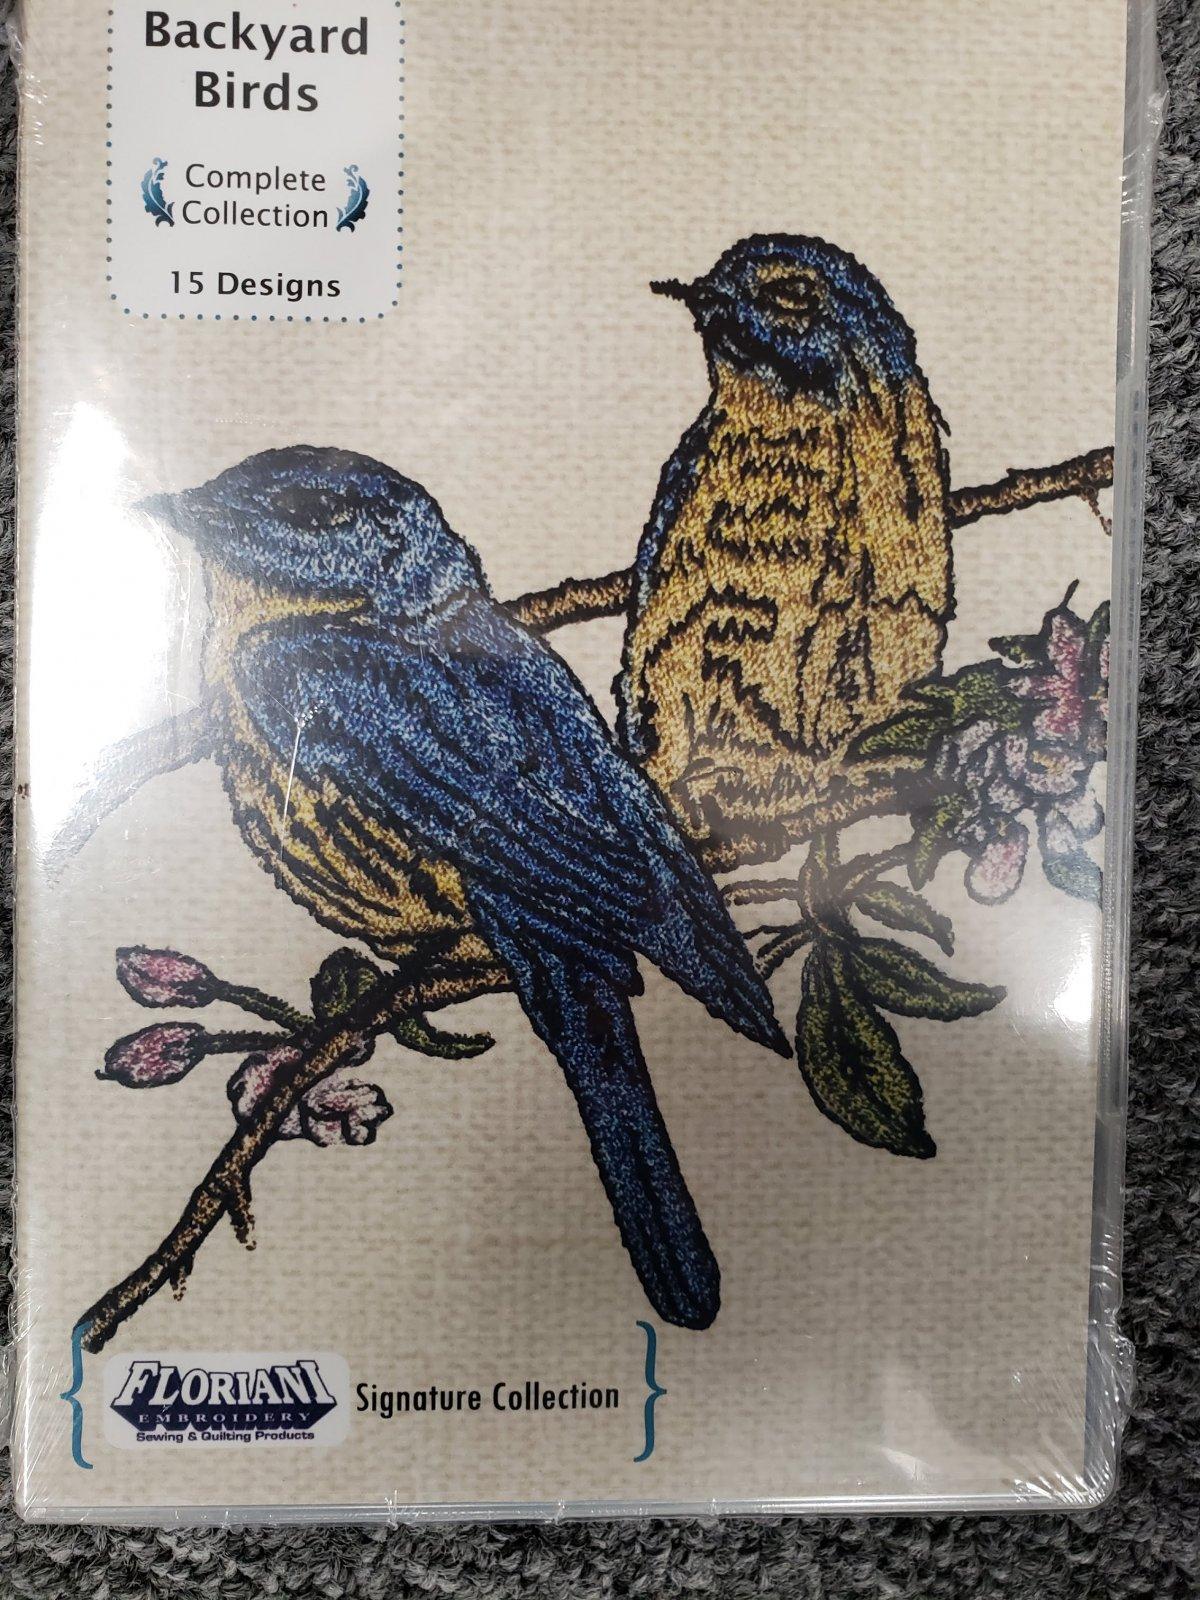 Backyard Birds - Floriani Embroidery Signature Collection